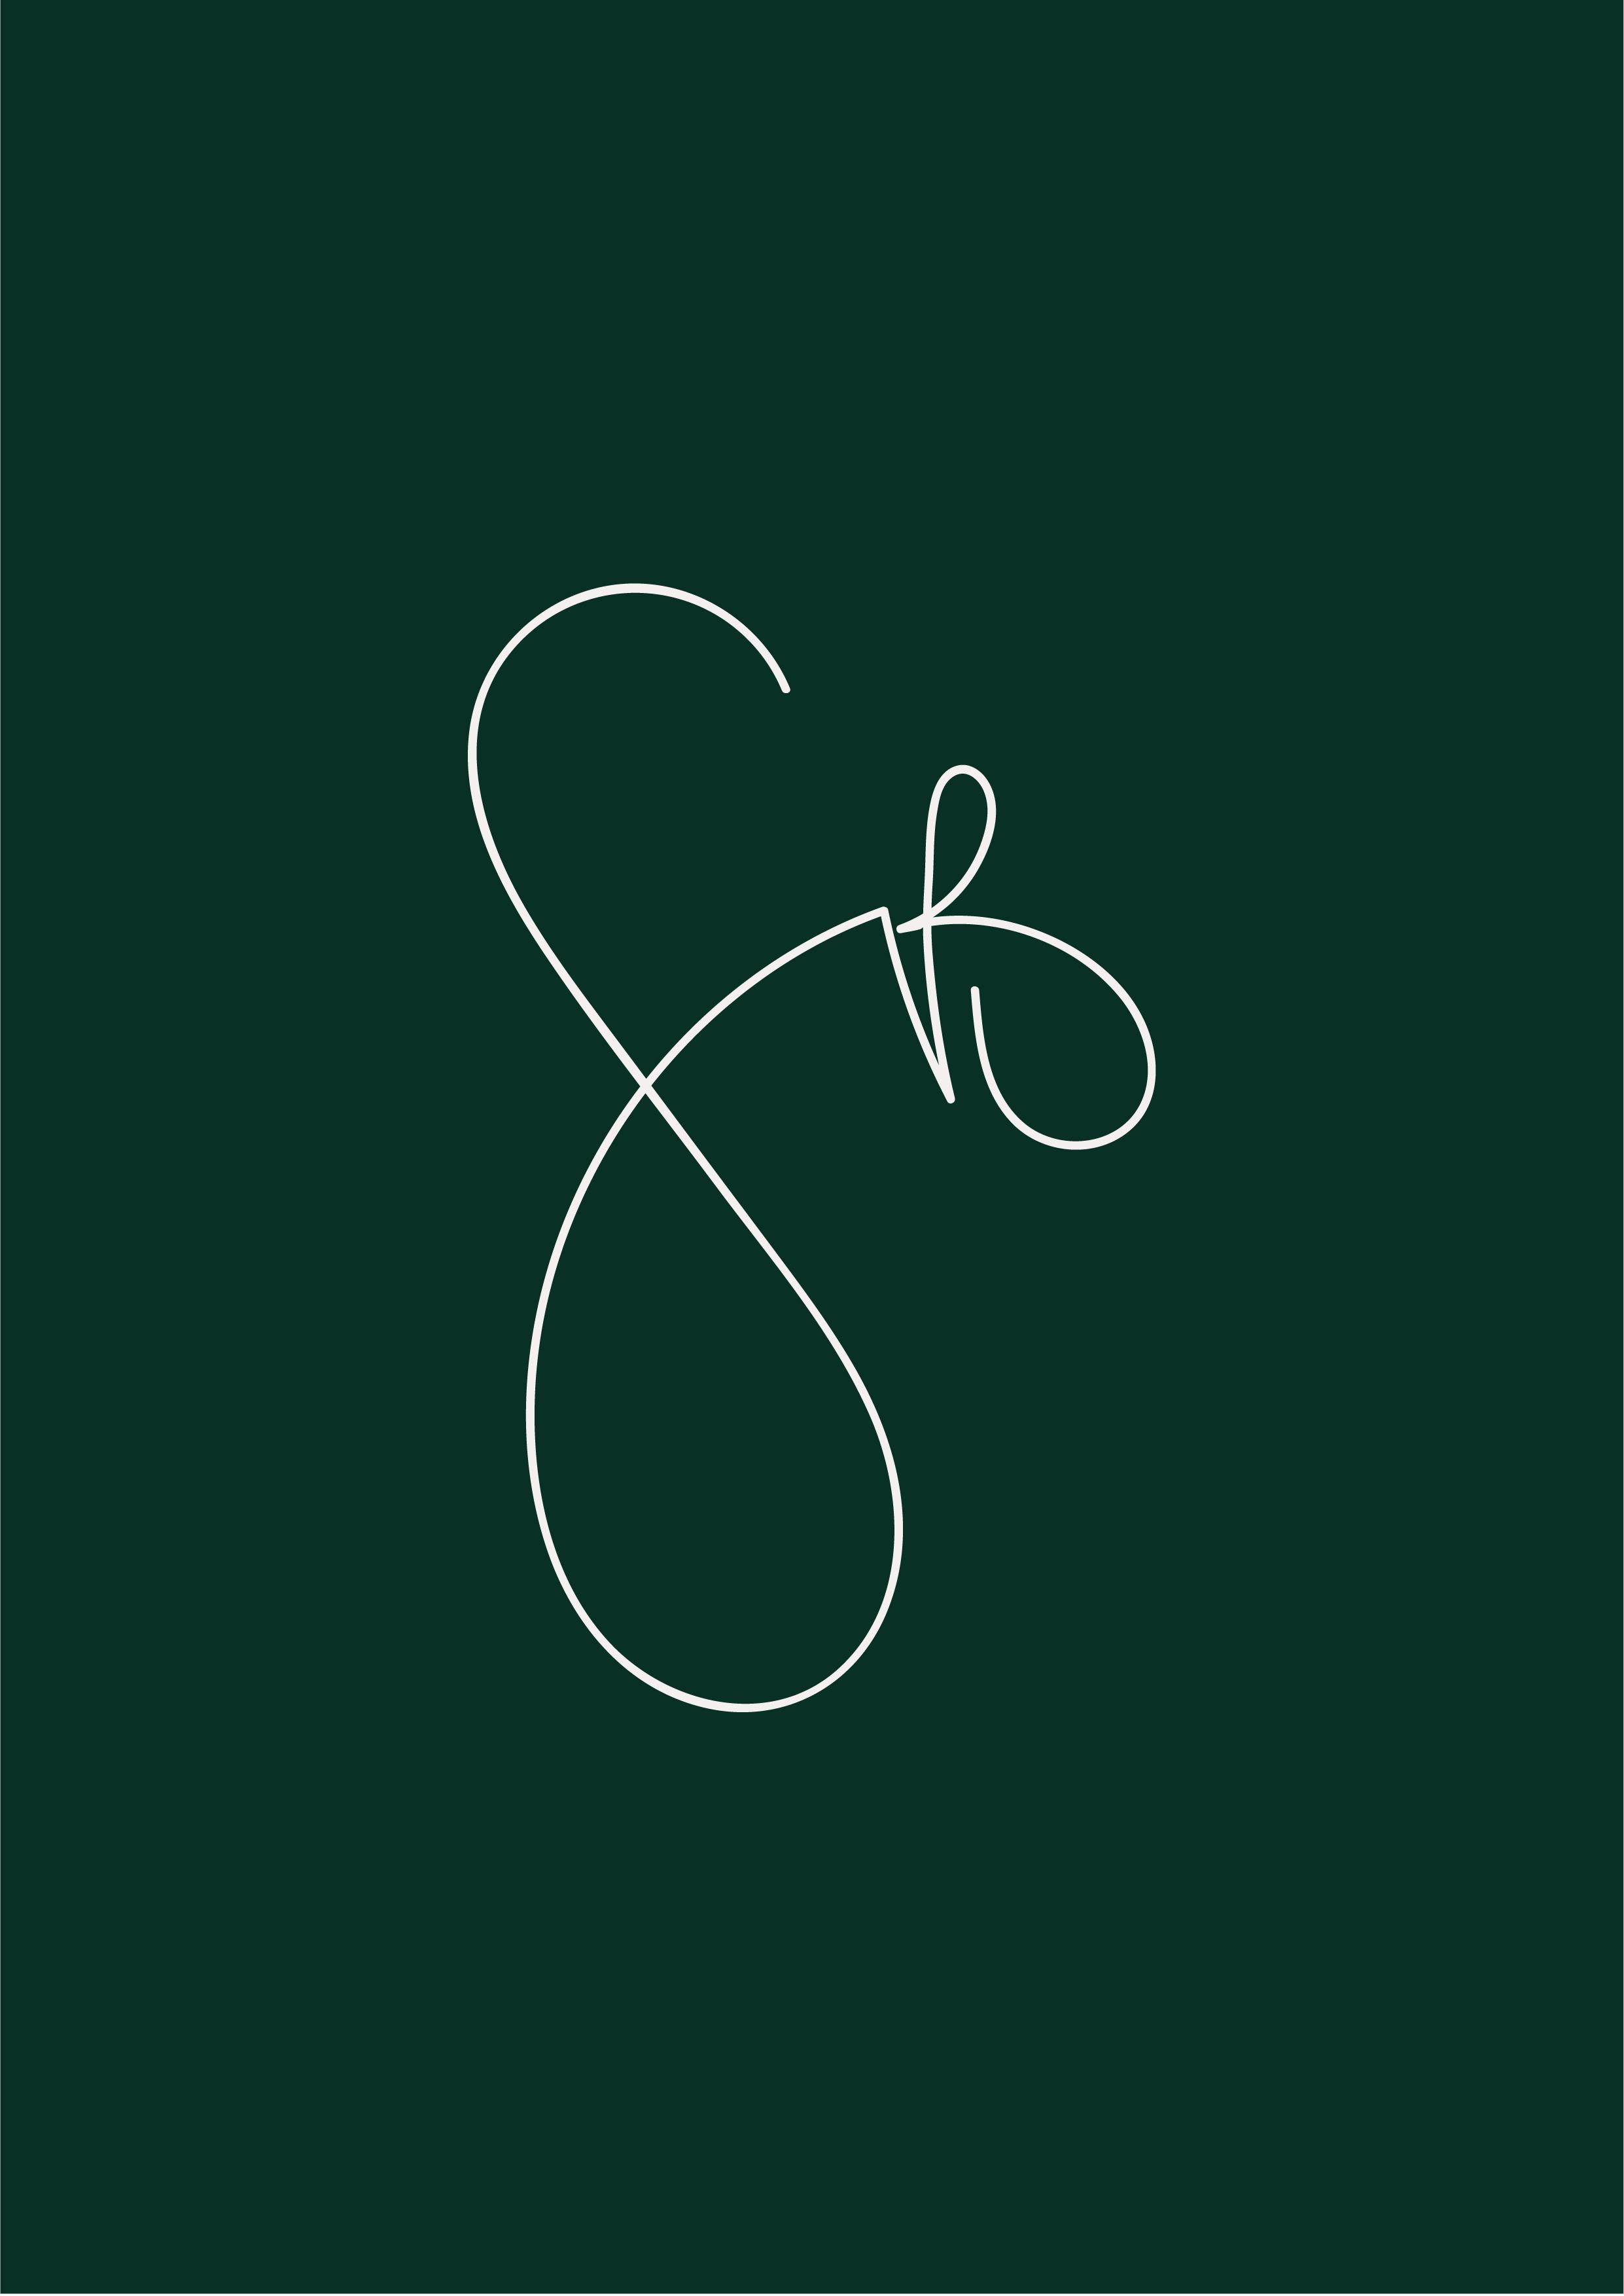 signture-02.png